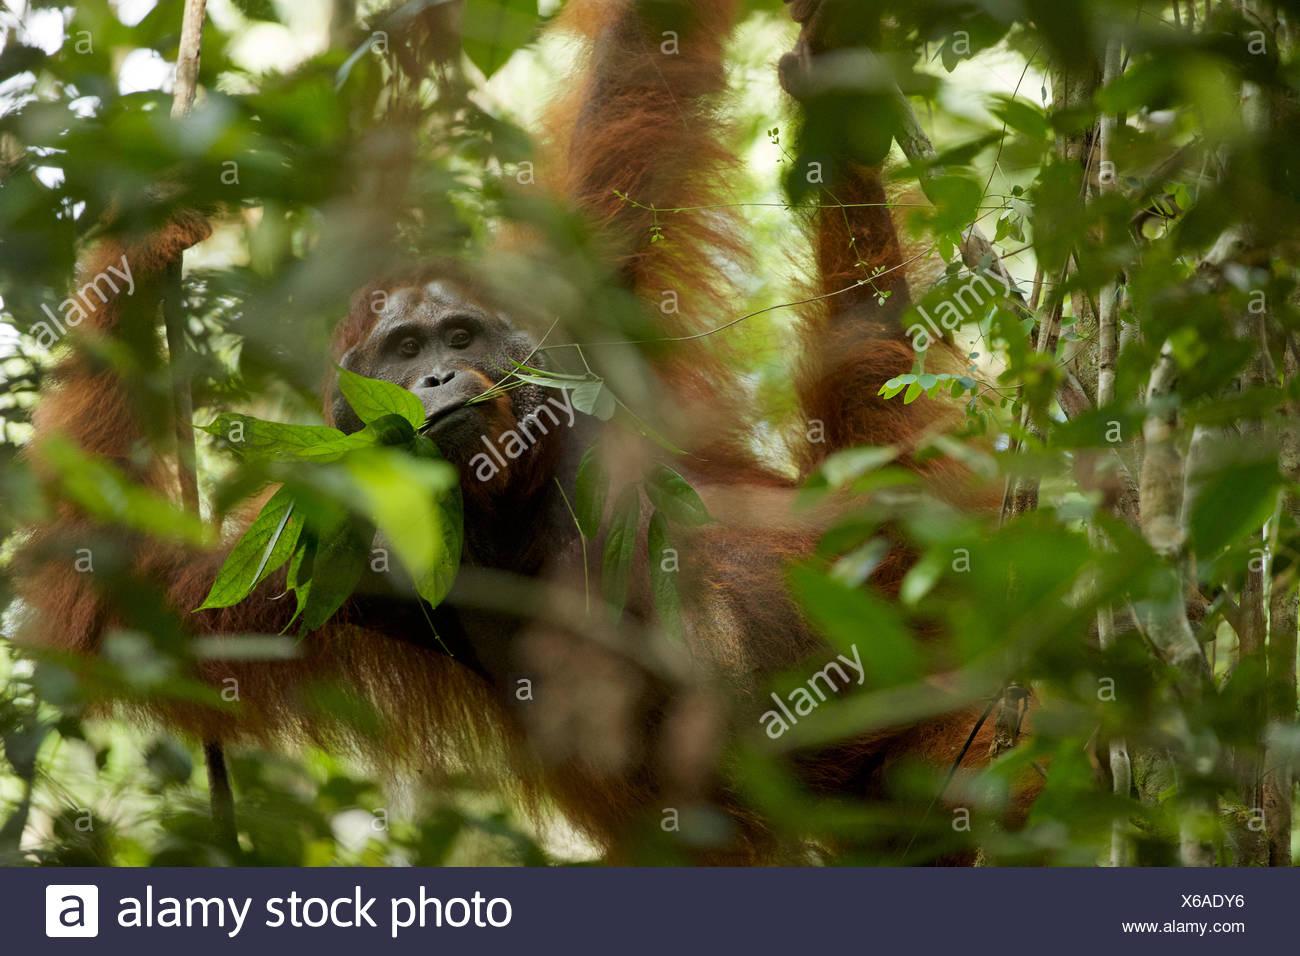 An adult male Bornean orangutan, Pongo pygmaeus wurmbii, hangs from a tree branch in Gunung Palung National Park. - Stock Image